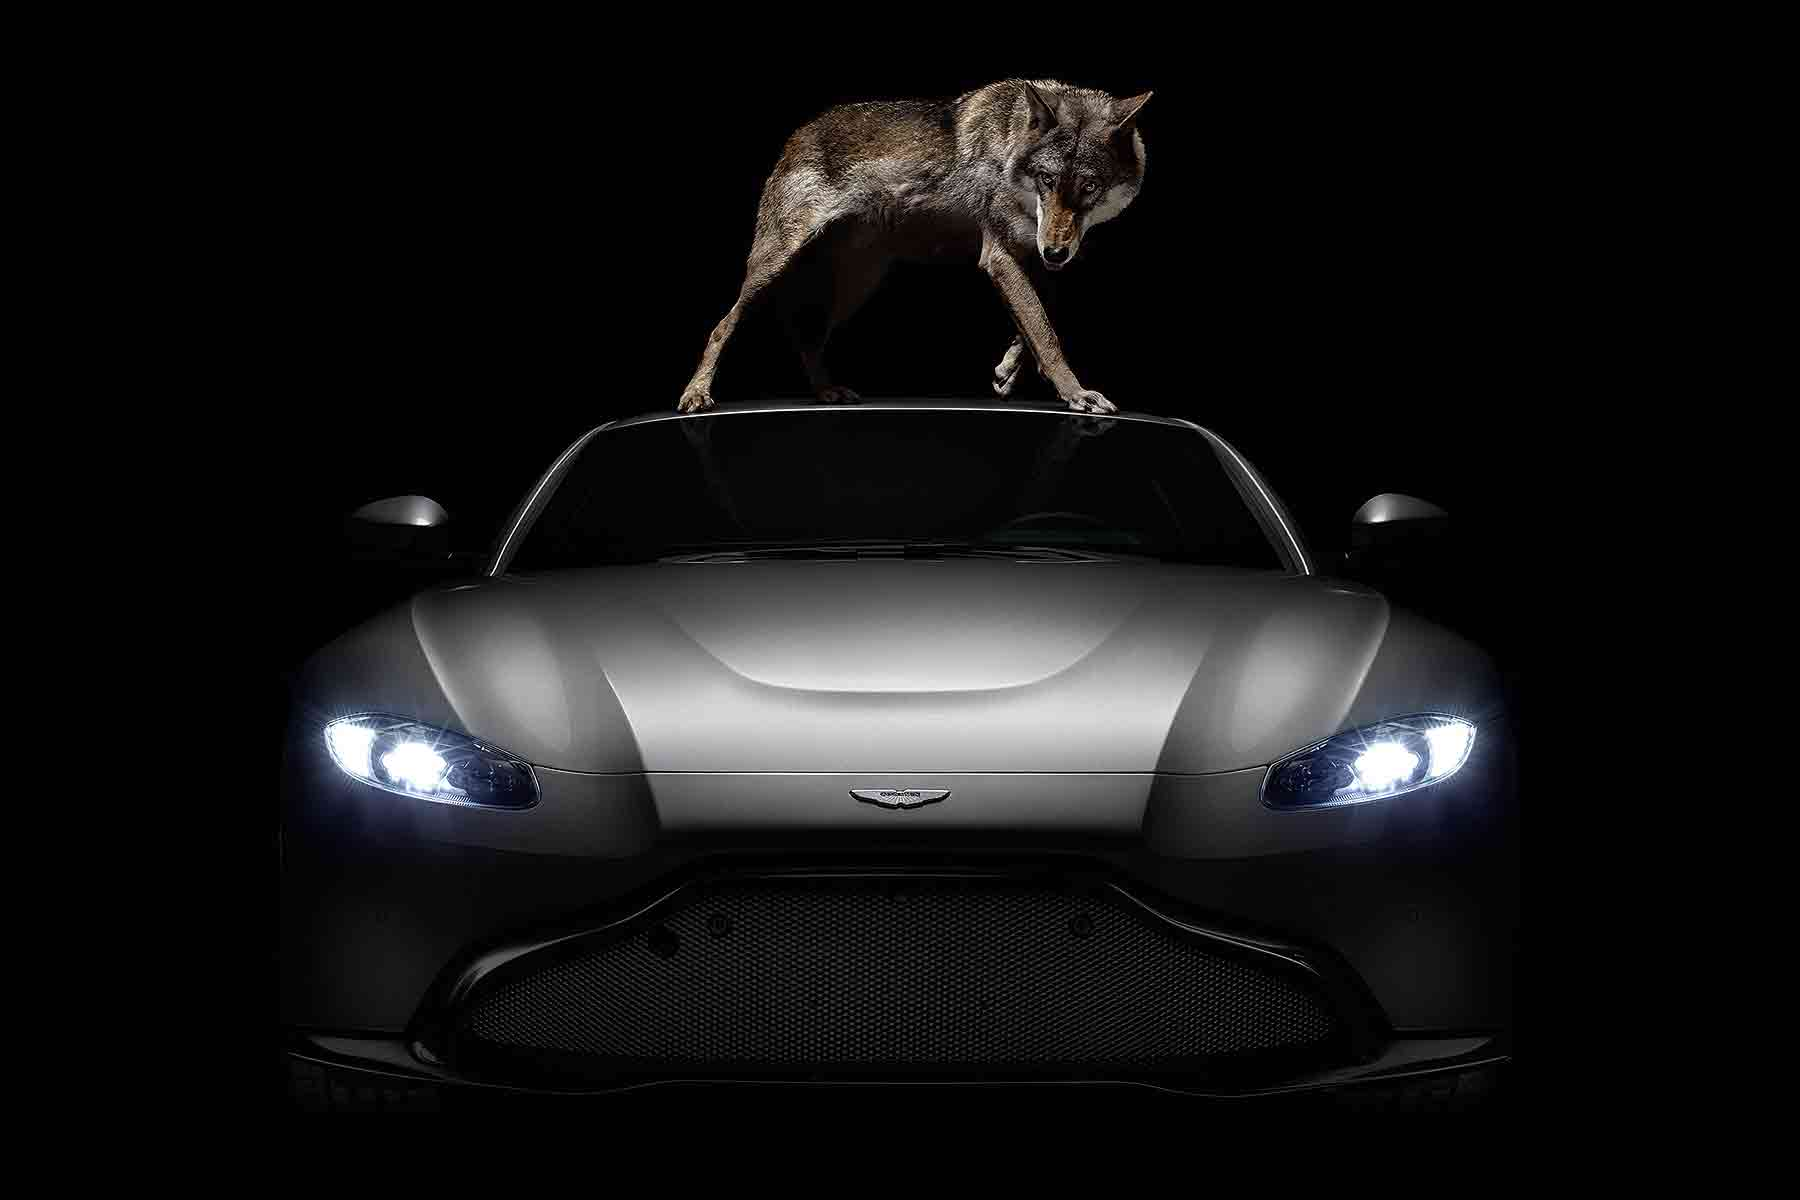 New Aston Martin Vantage by Rankin